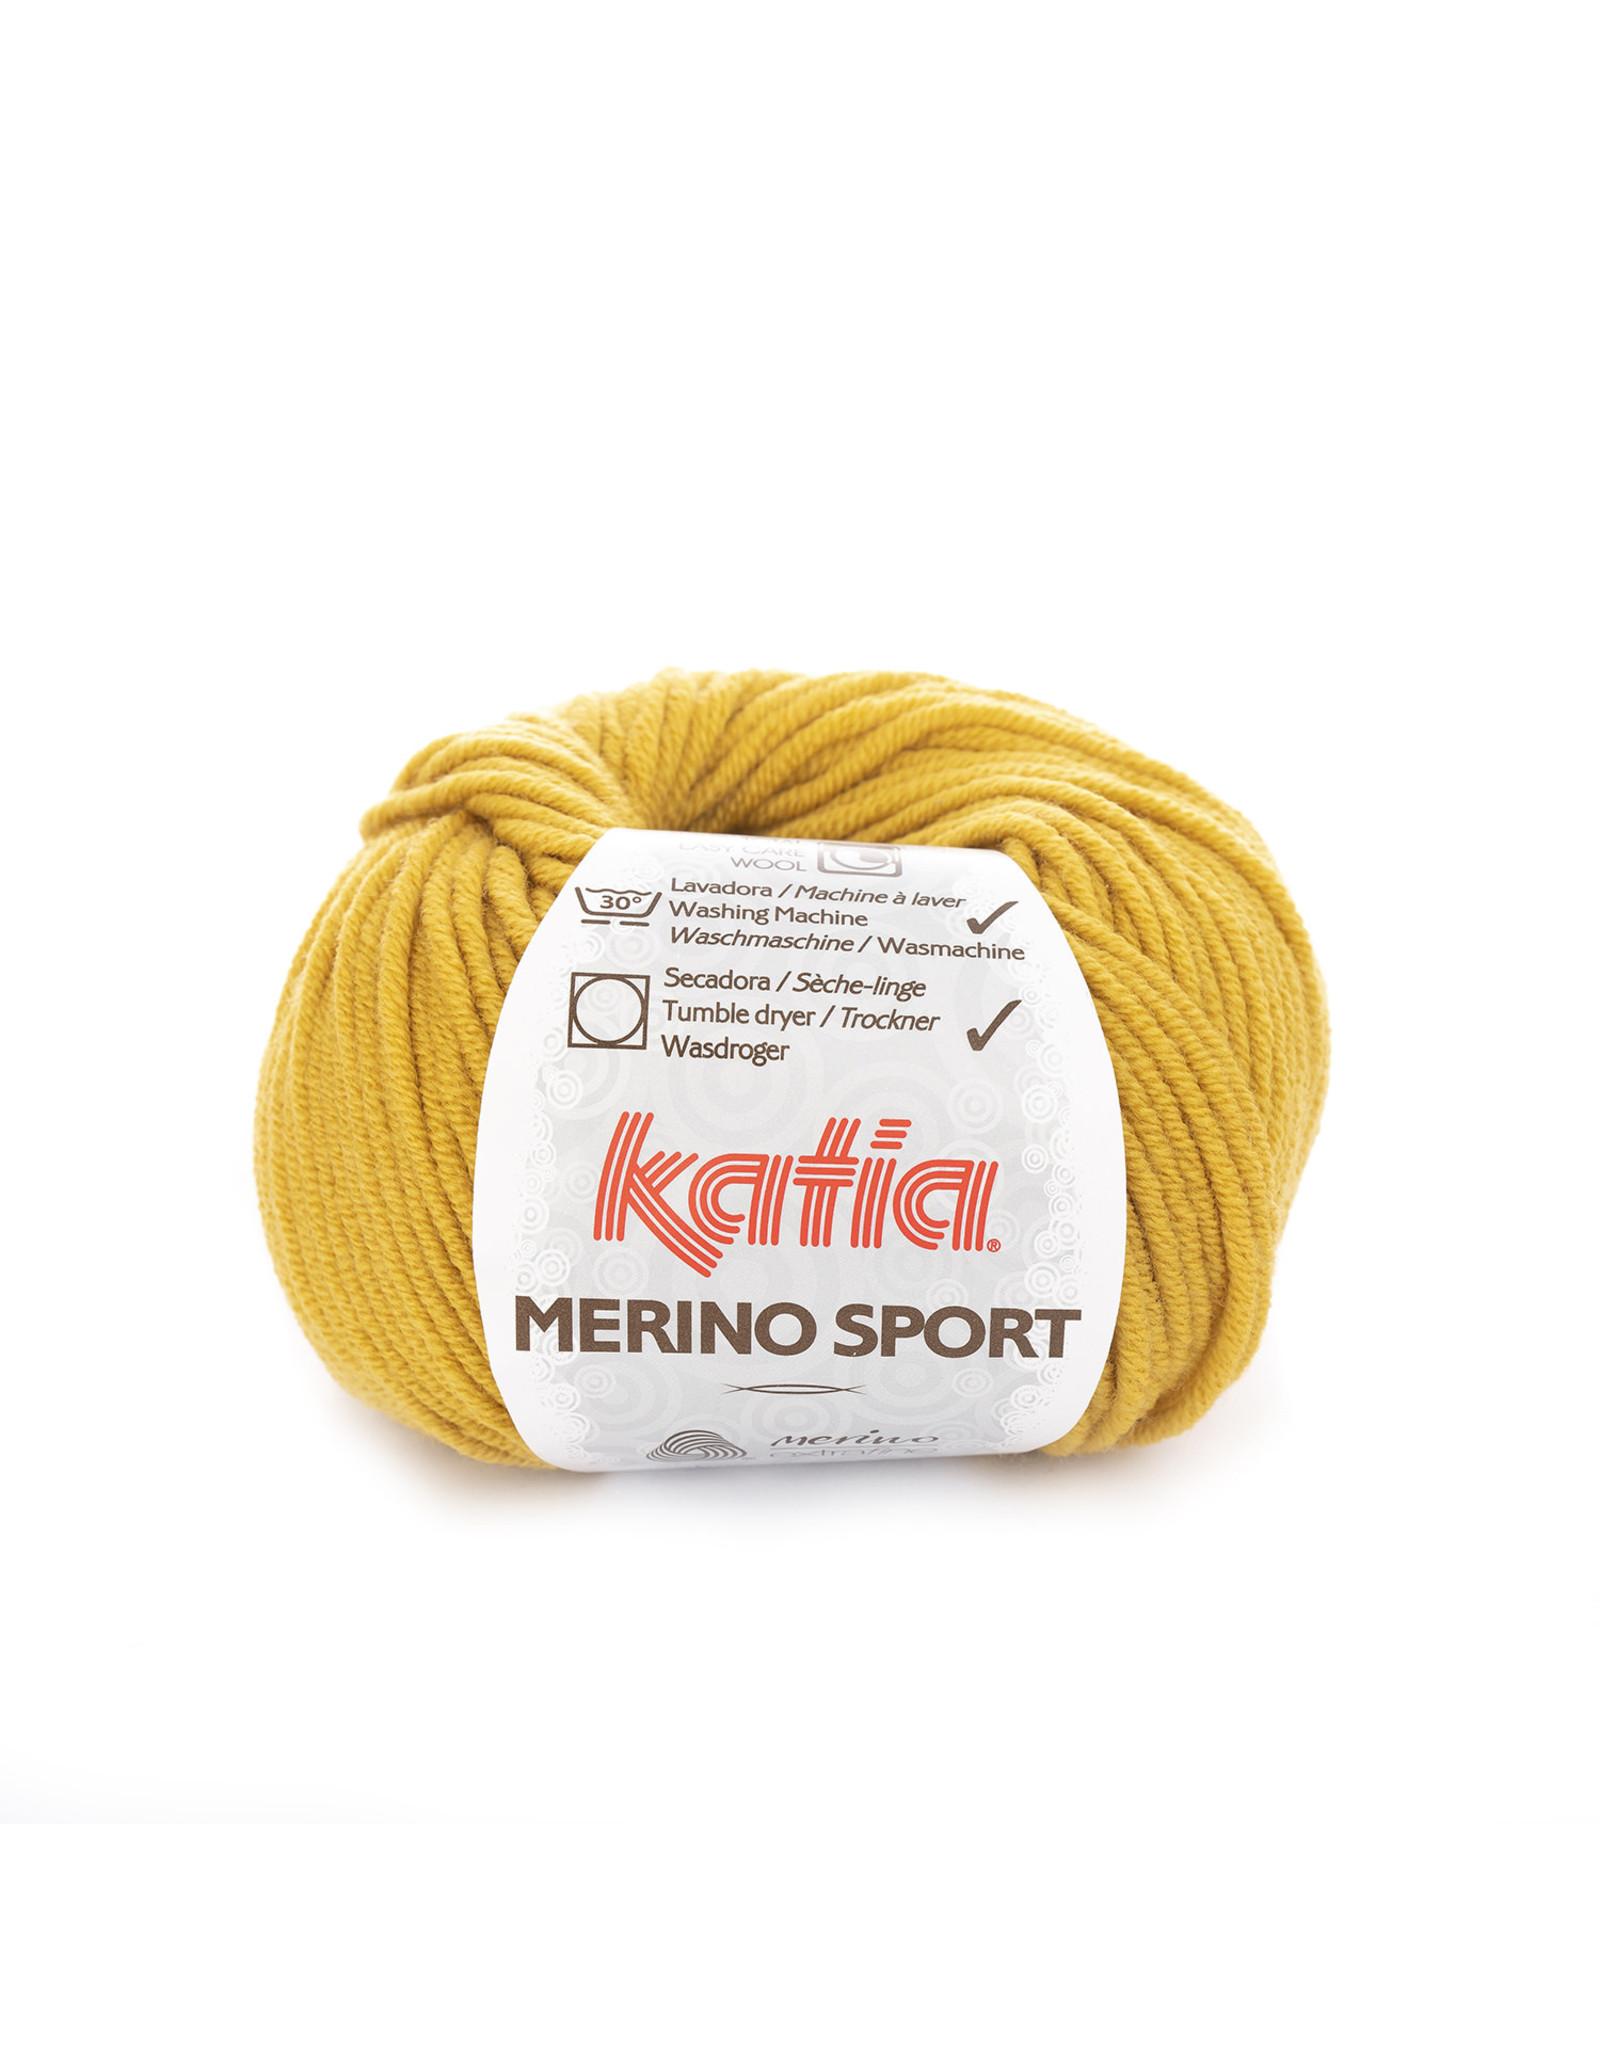 Katia Katia - Merino Sport - 44 Mosterdgeel - 50 gr.